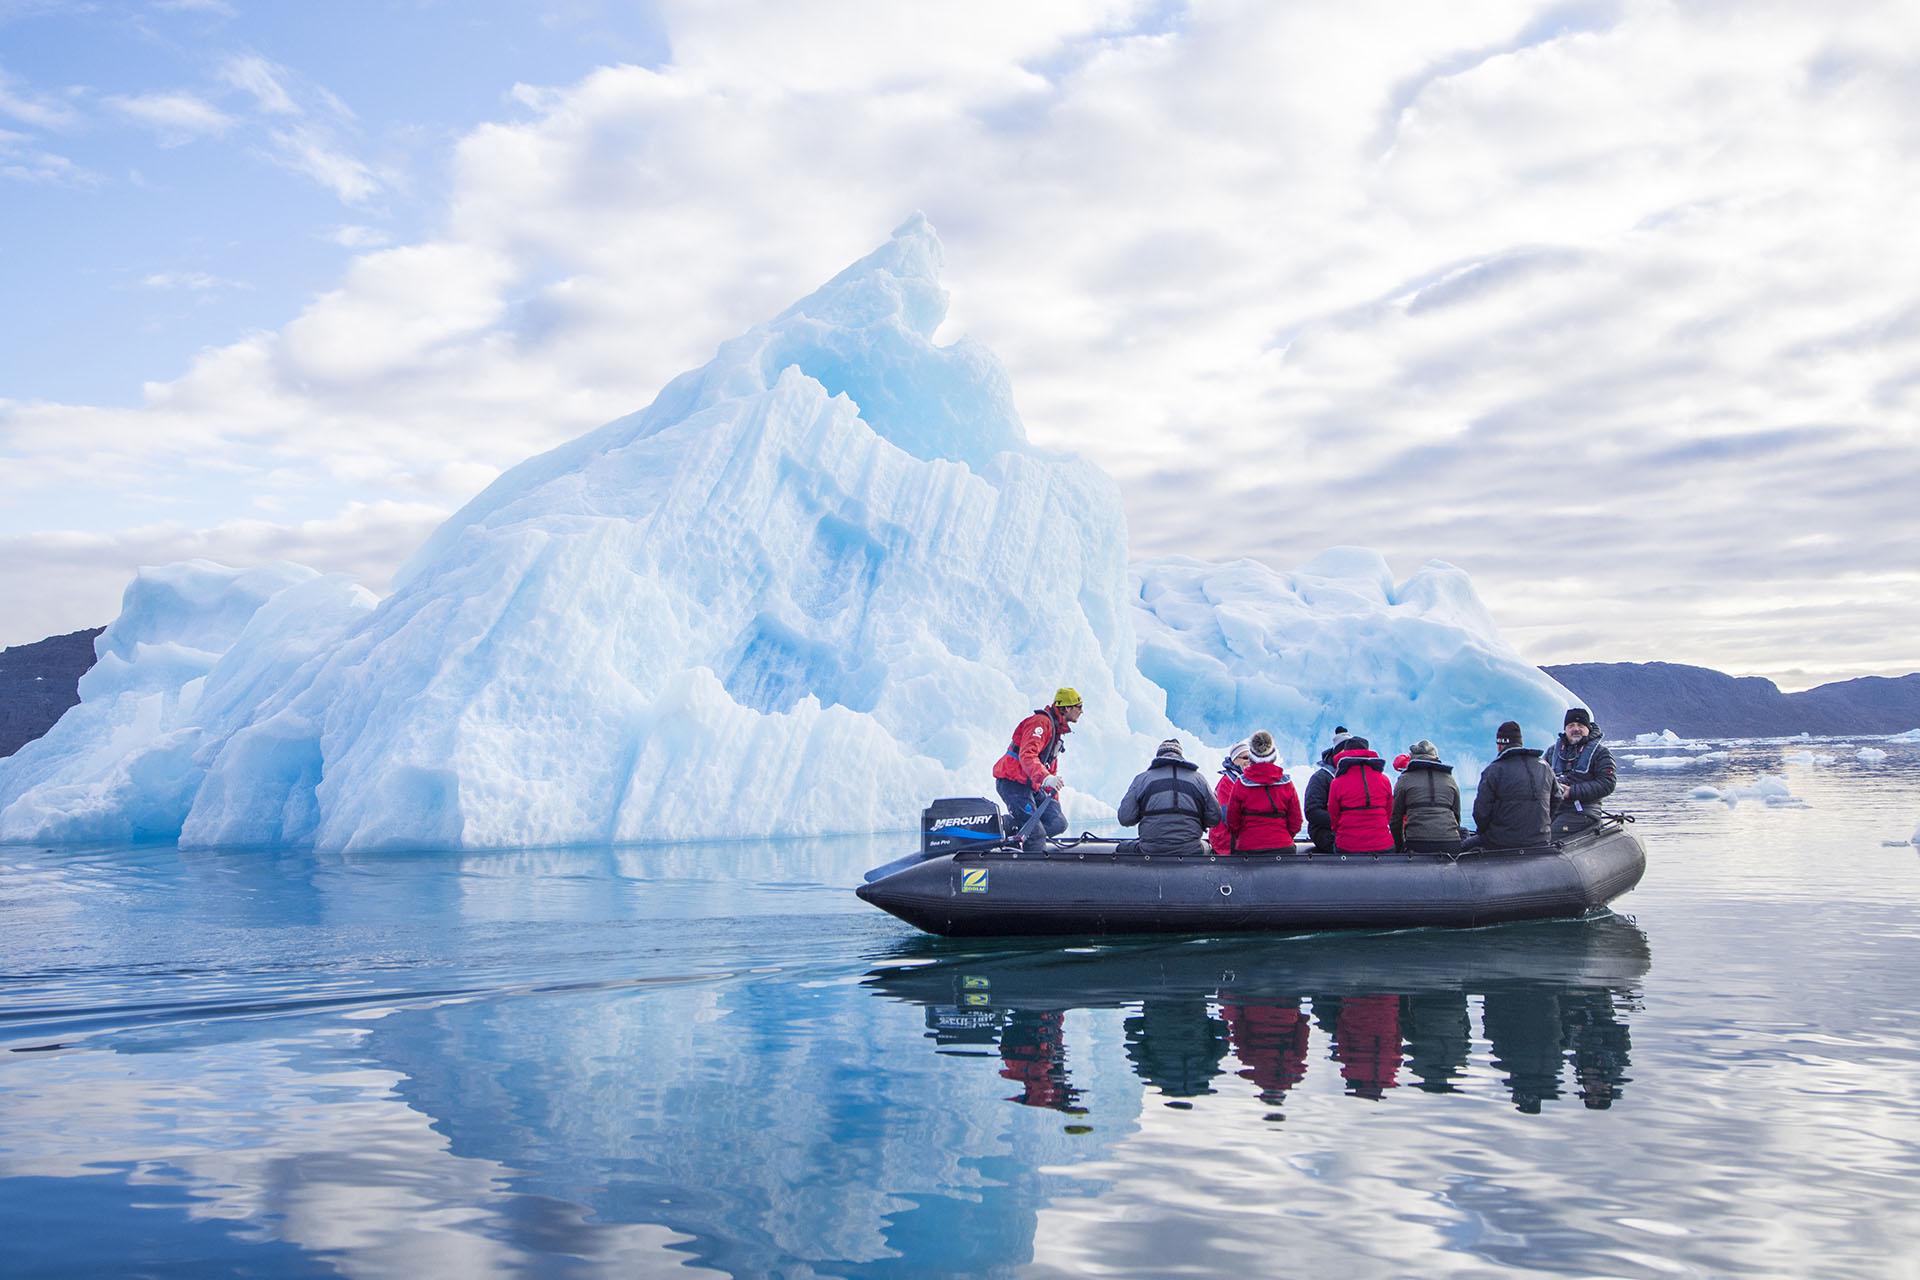 Turistas en un Zodíaco frente a un iceberg, Groenlandia